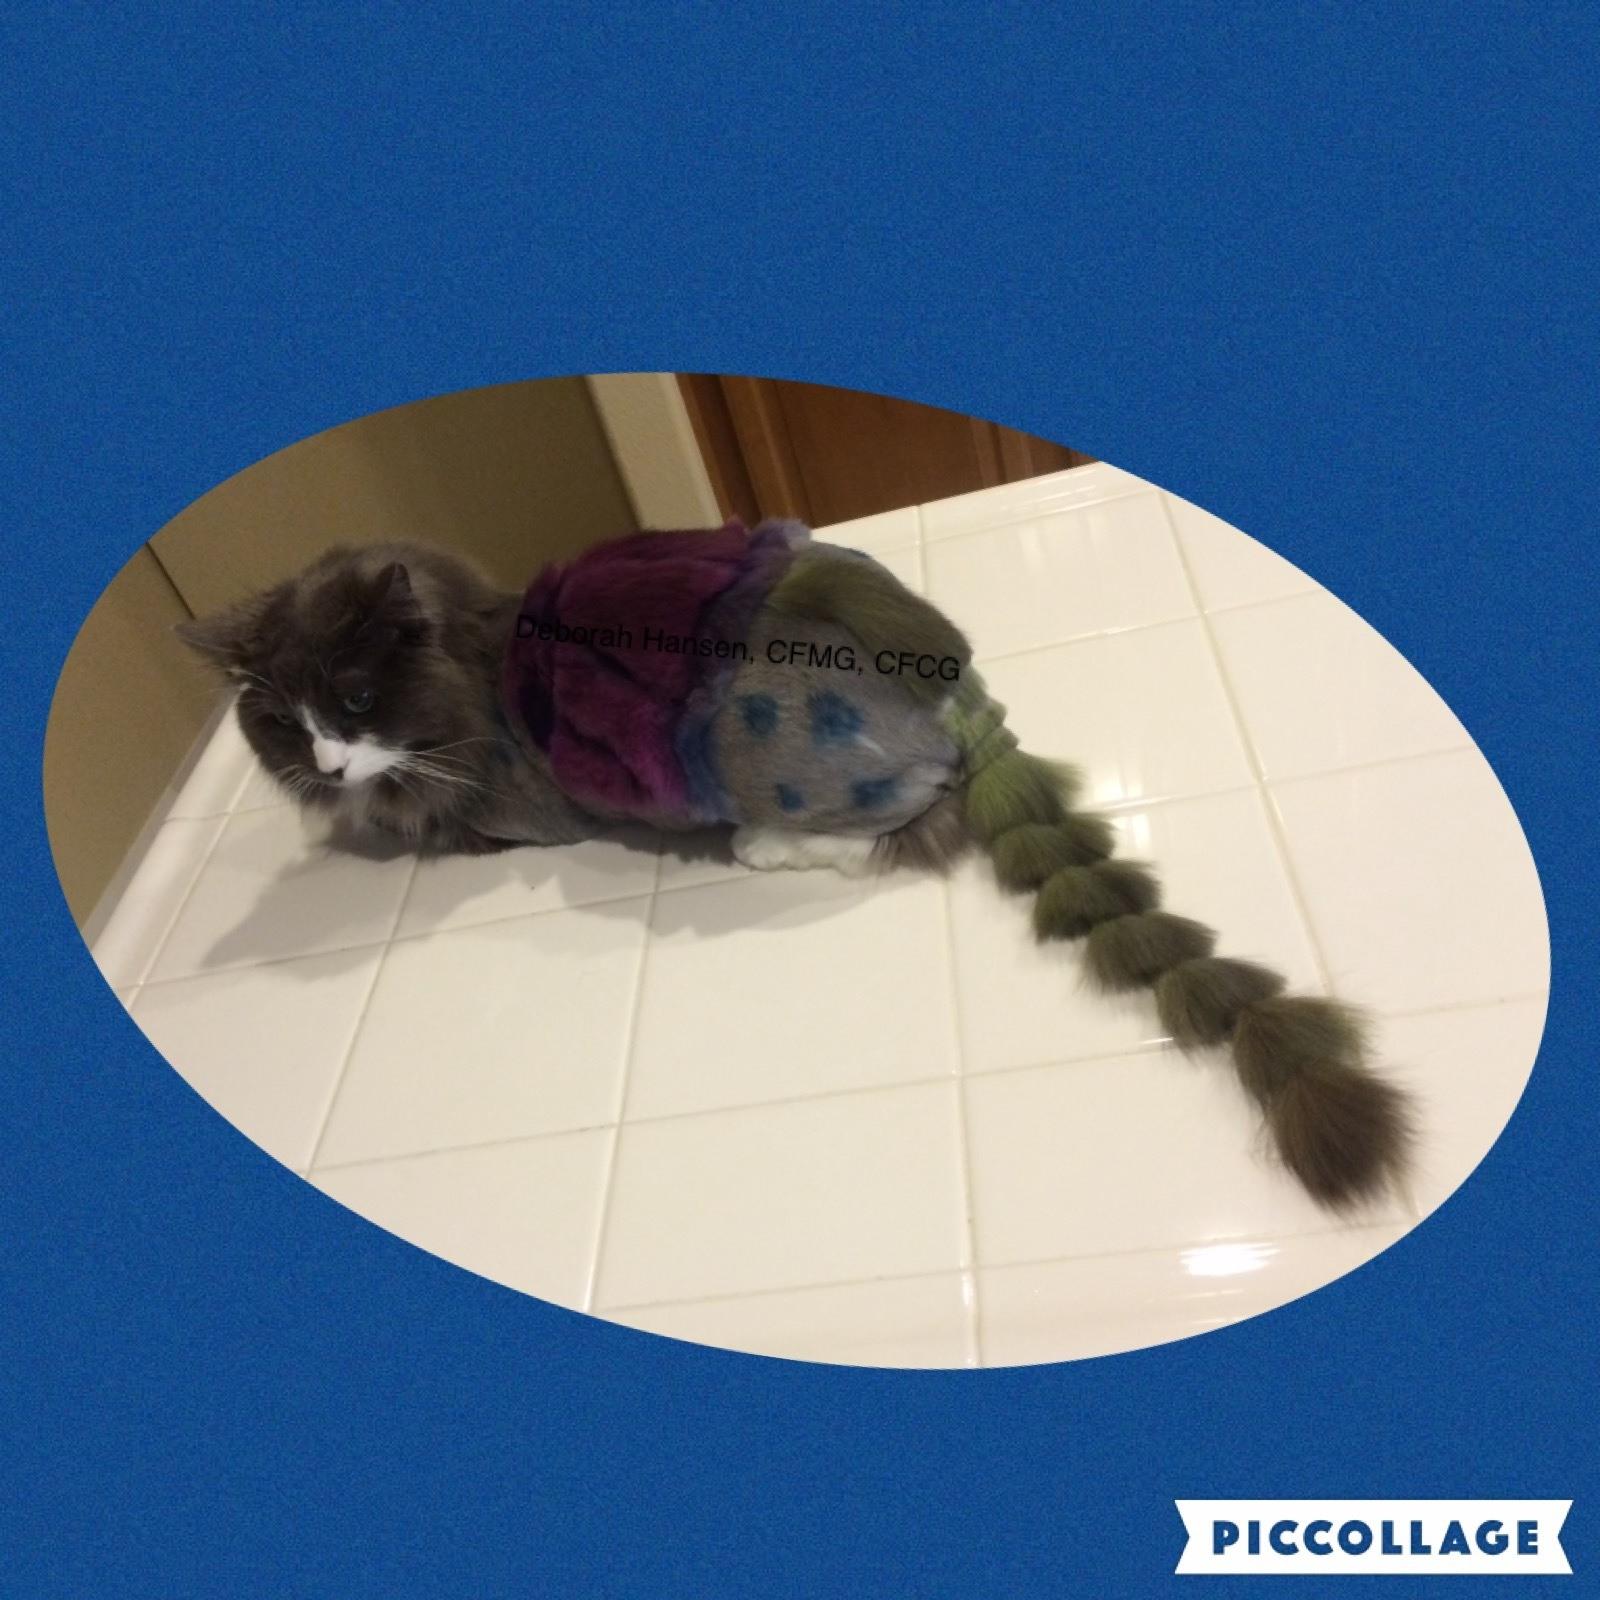 Umbrella Cat by Deborah Hansen, CFMG, CFCG, creative cat grooming